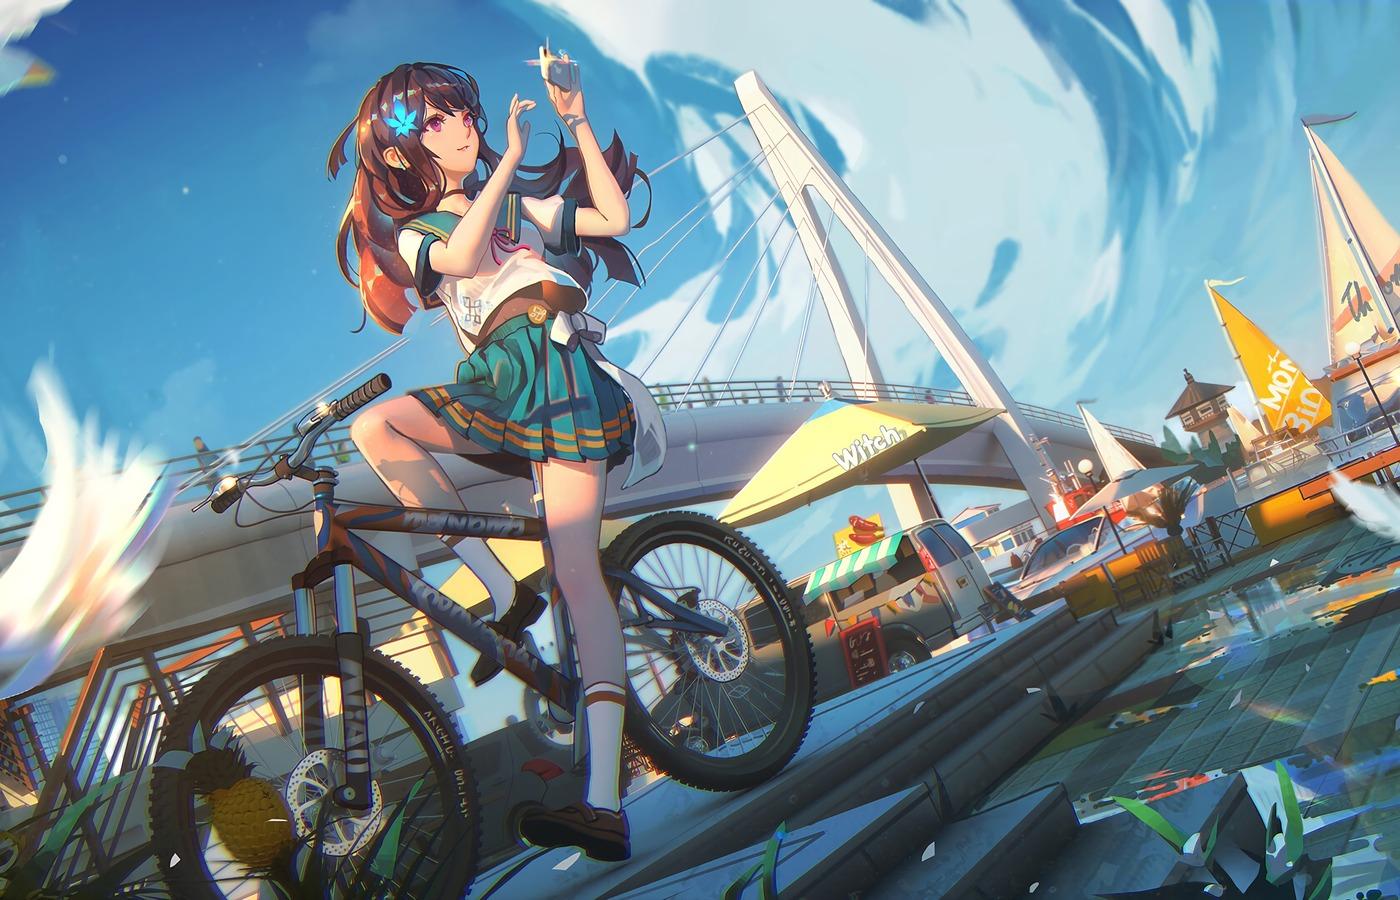 anime-girl-cycle-4k-vc.jpg